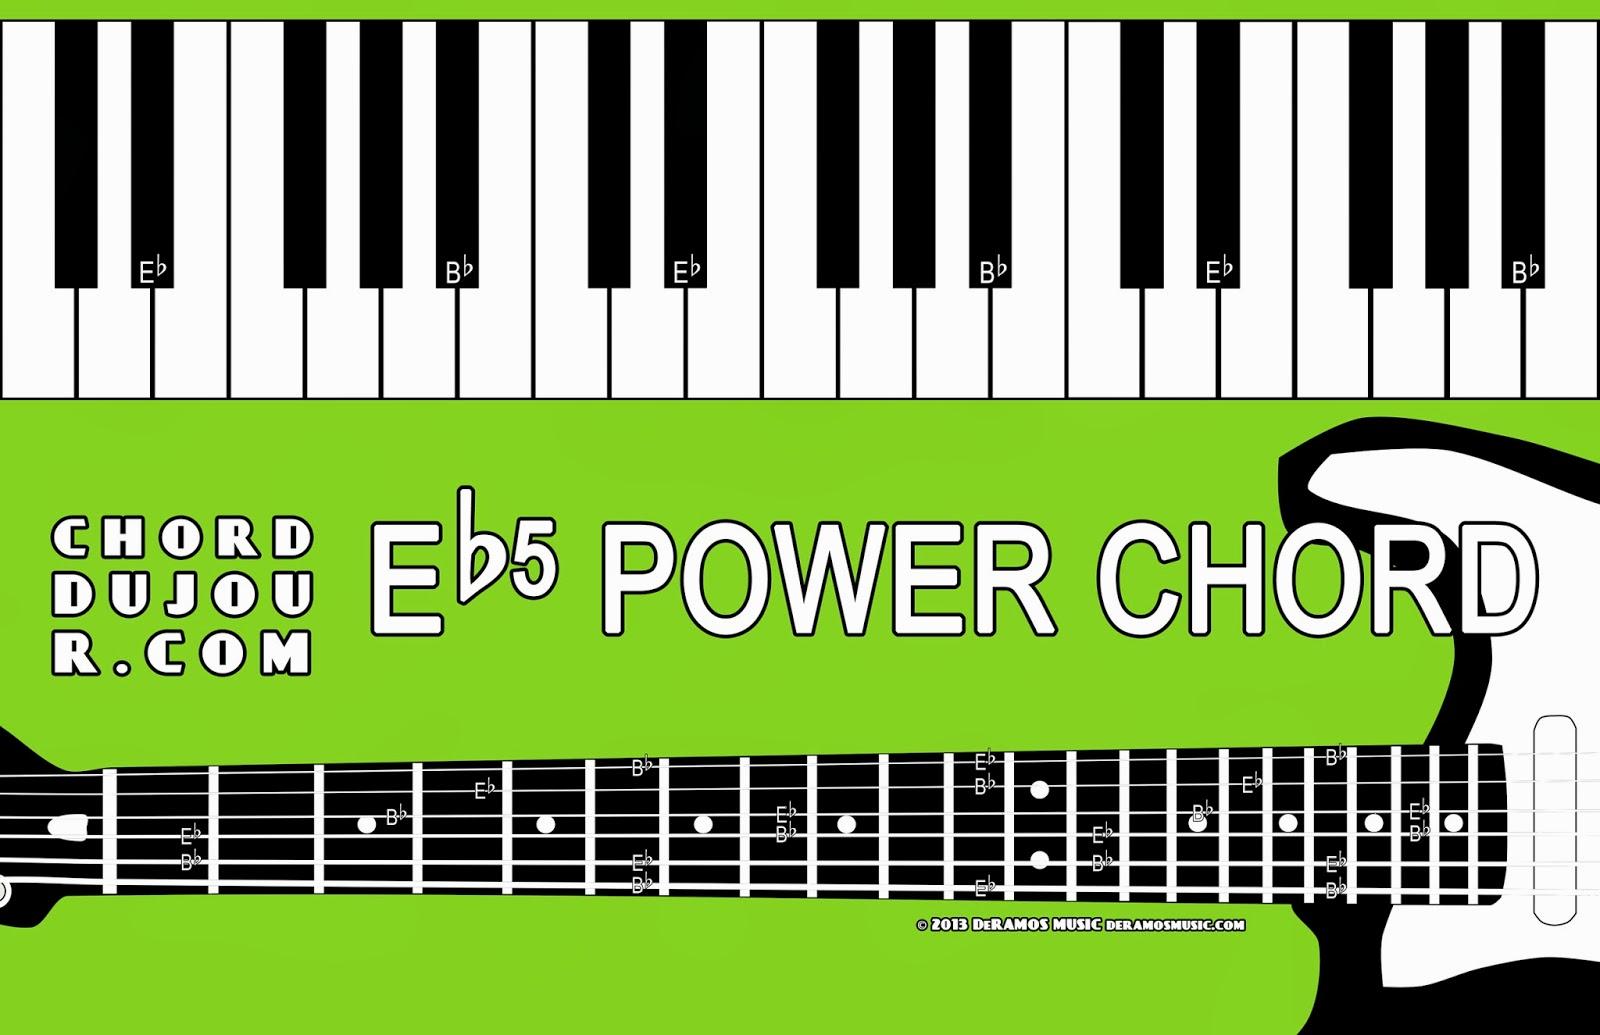 Chord du jour dictionary eb5 power chord dictionary eb5 power chord hexwebz Choice Image